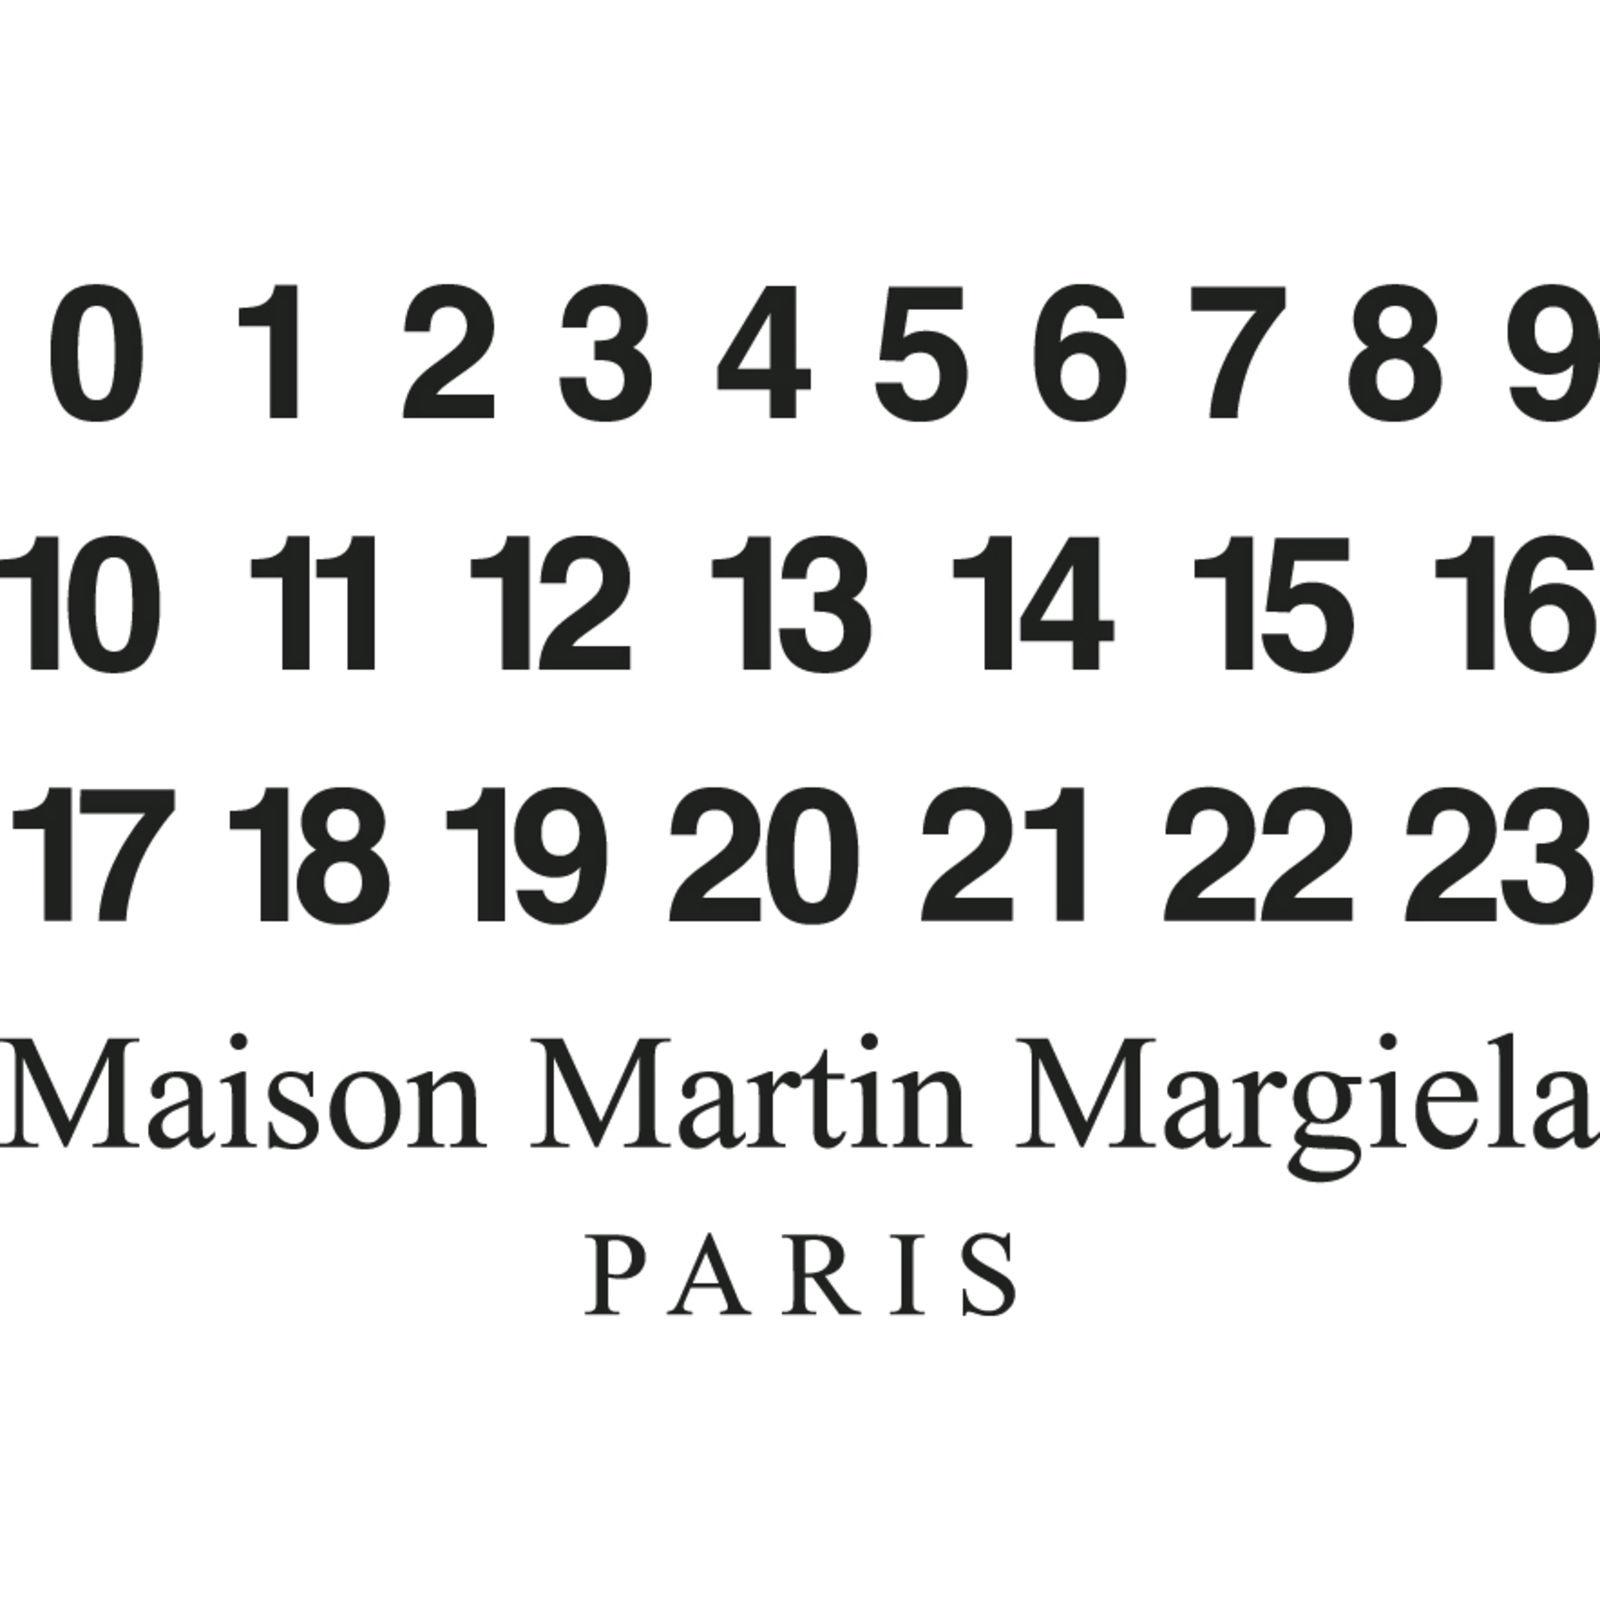 Maison Martin Margiela Fragrances (Bild 1)